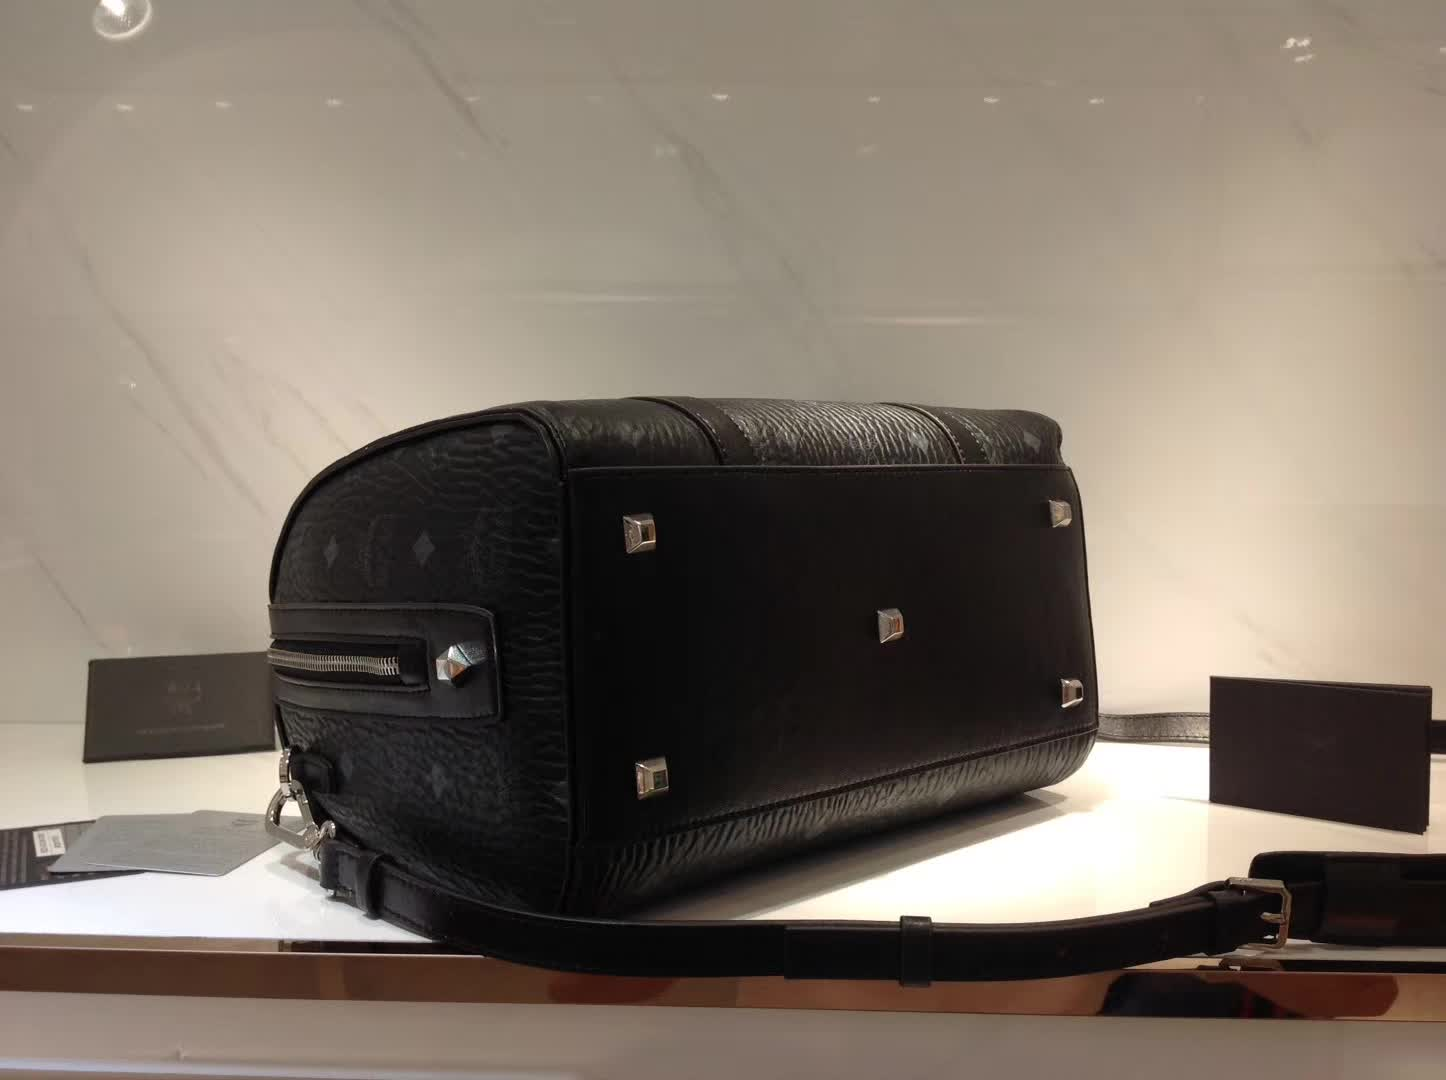 MCM韩国官网 2017款Visetos Original Essential系列波士顿包 全新优质进口PVC材料 黑色